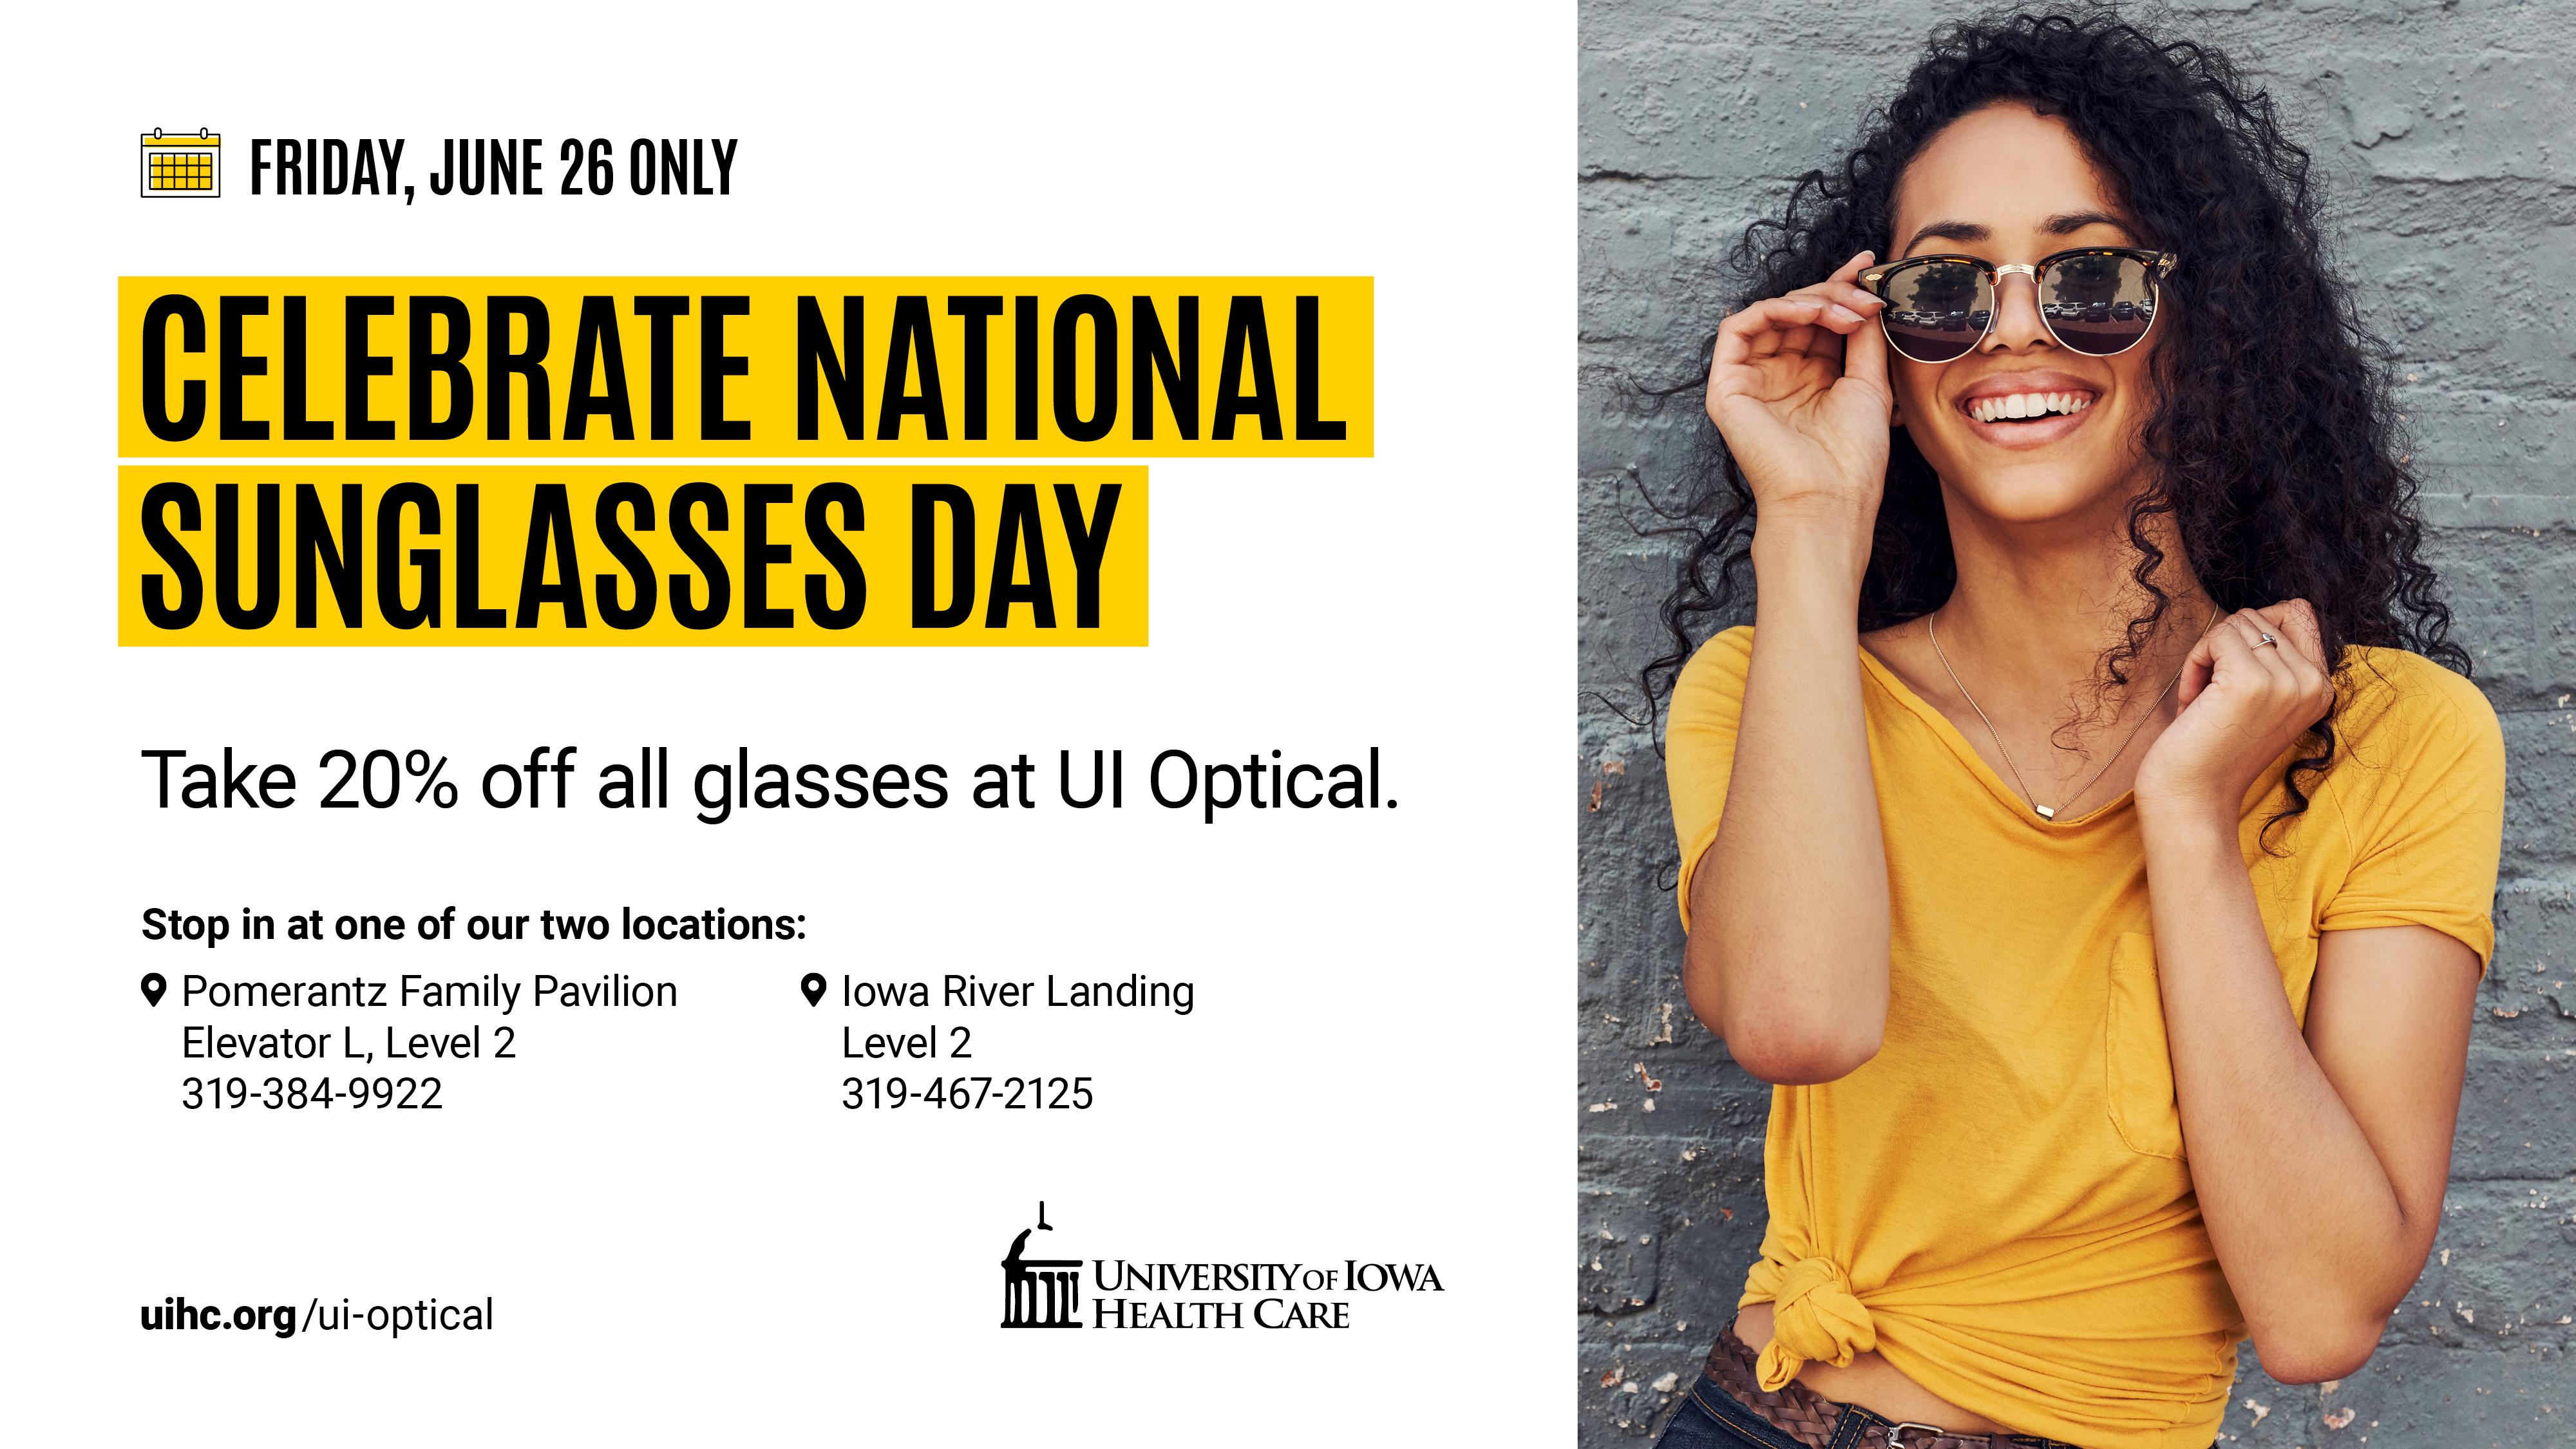 UI Optical 'National Sunglasses Day' Sale promotional image